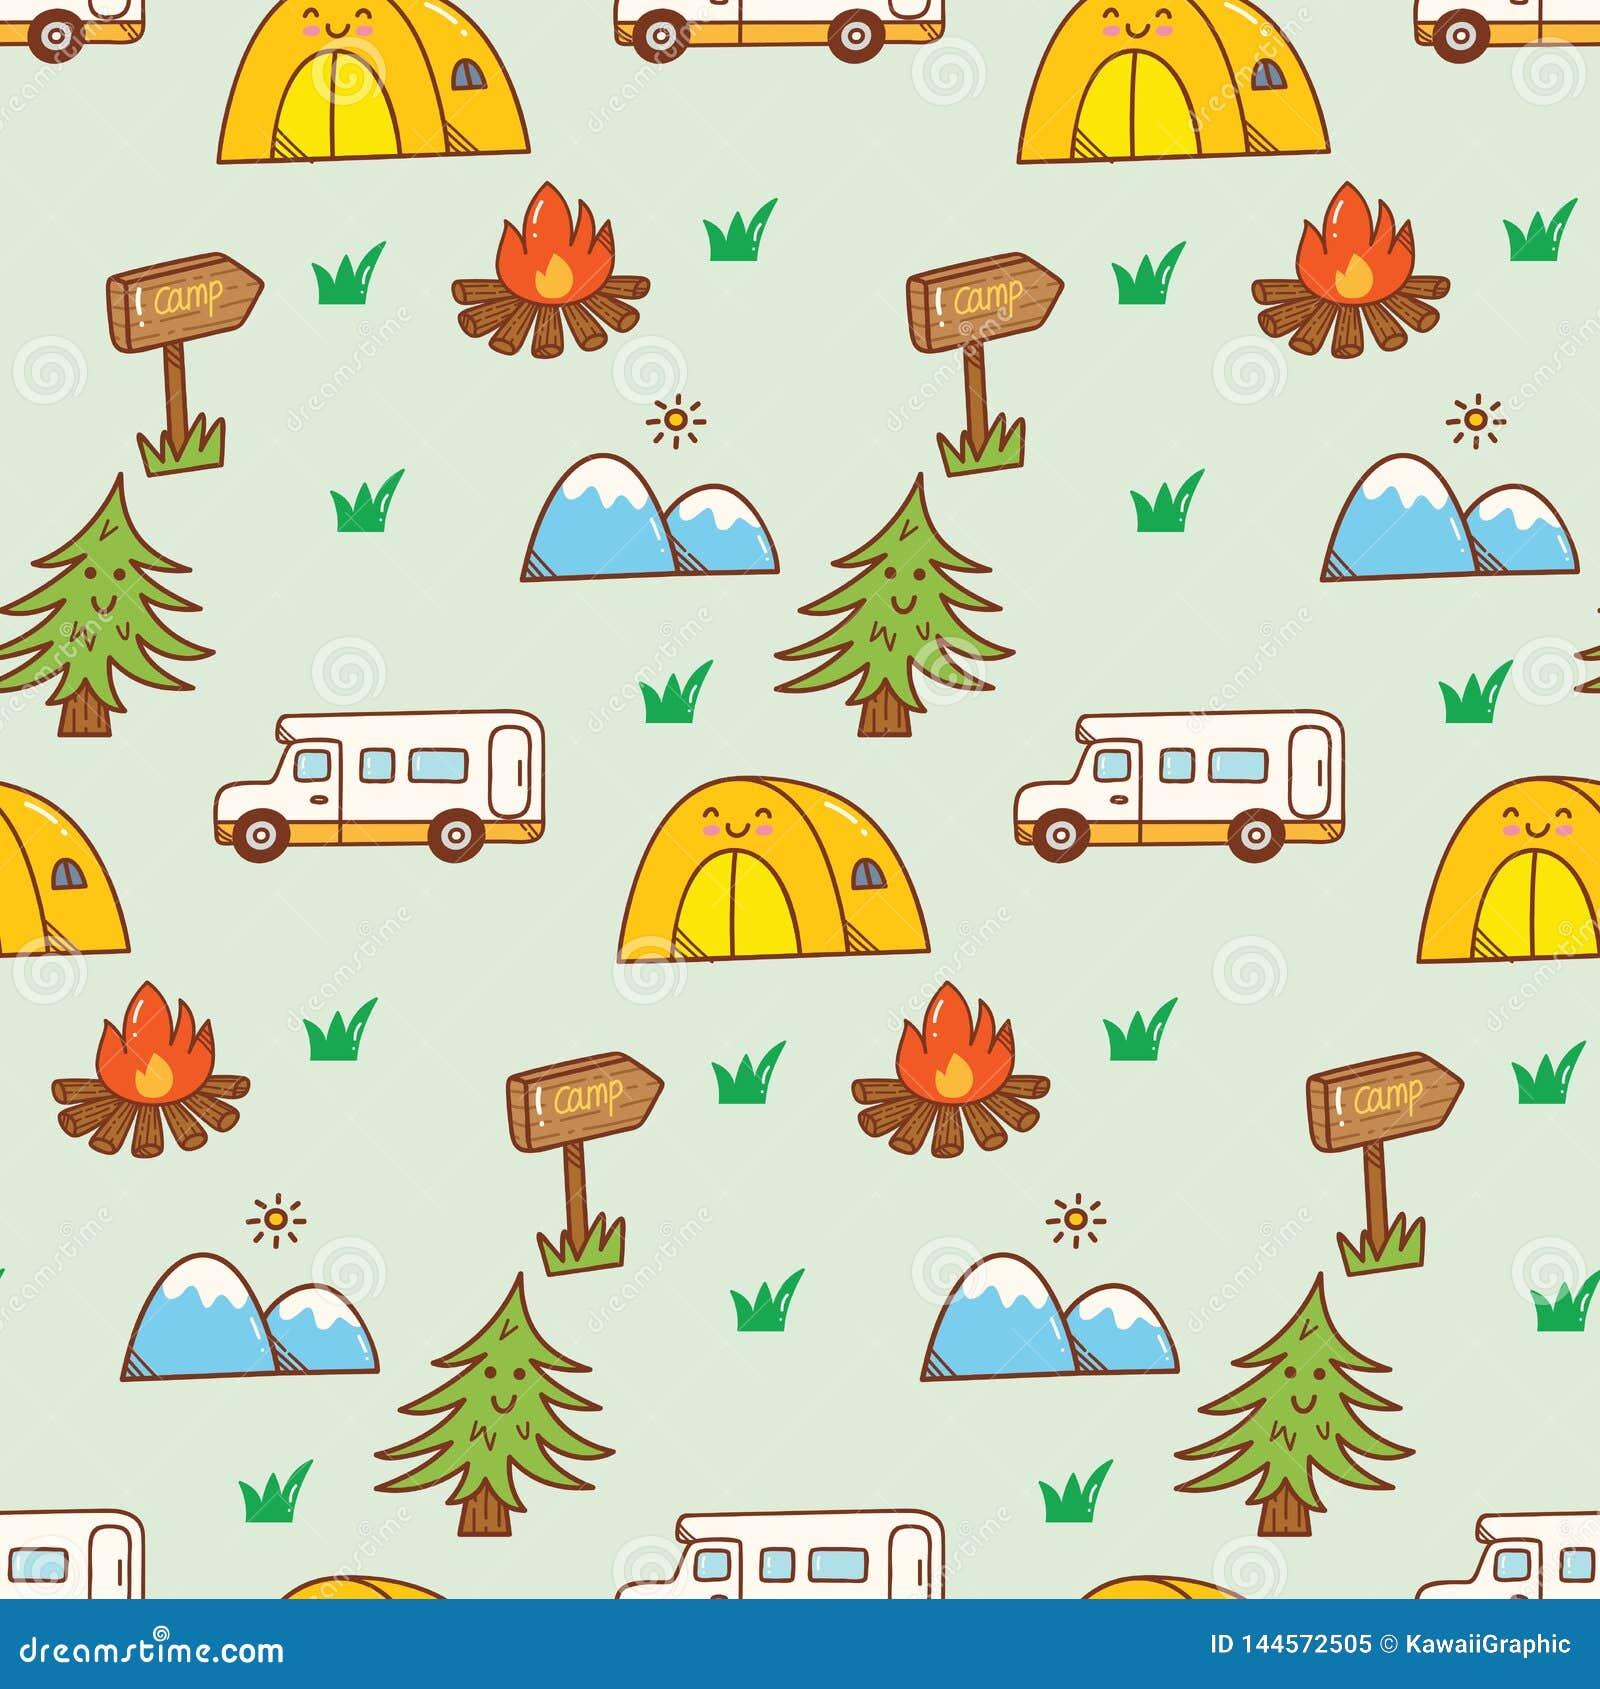 Camping Stuff Kawaii Doodle Seamless Background Stock Illustration Illustration Of Mountain Campfire 144572505